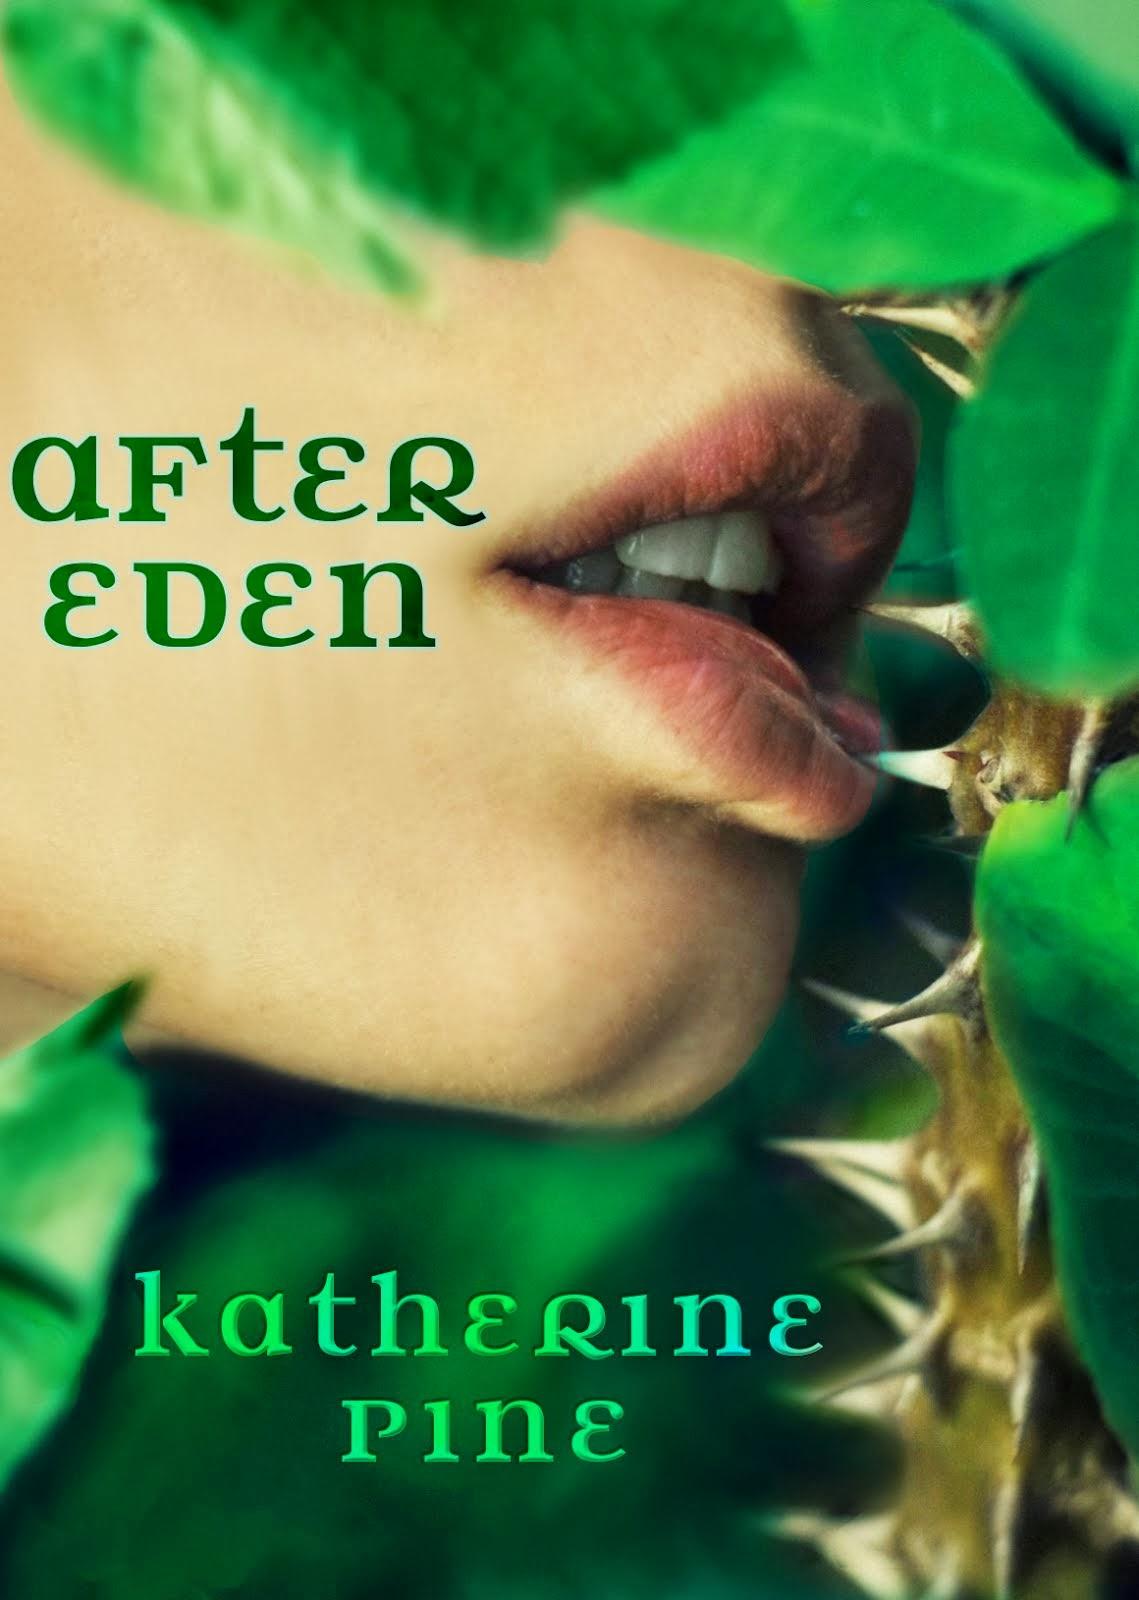 Katherine Pine